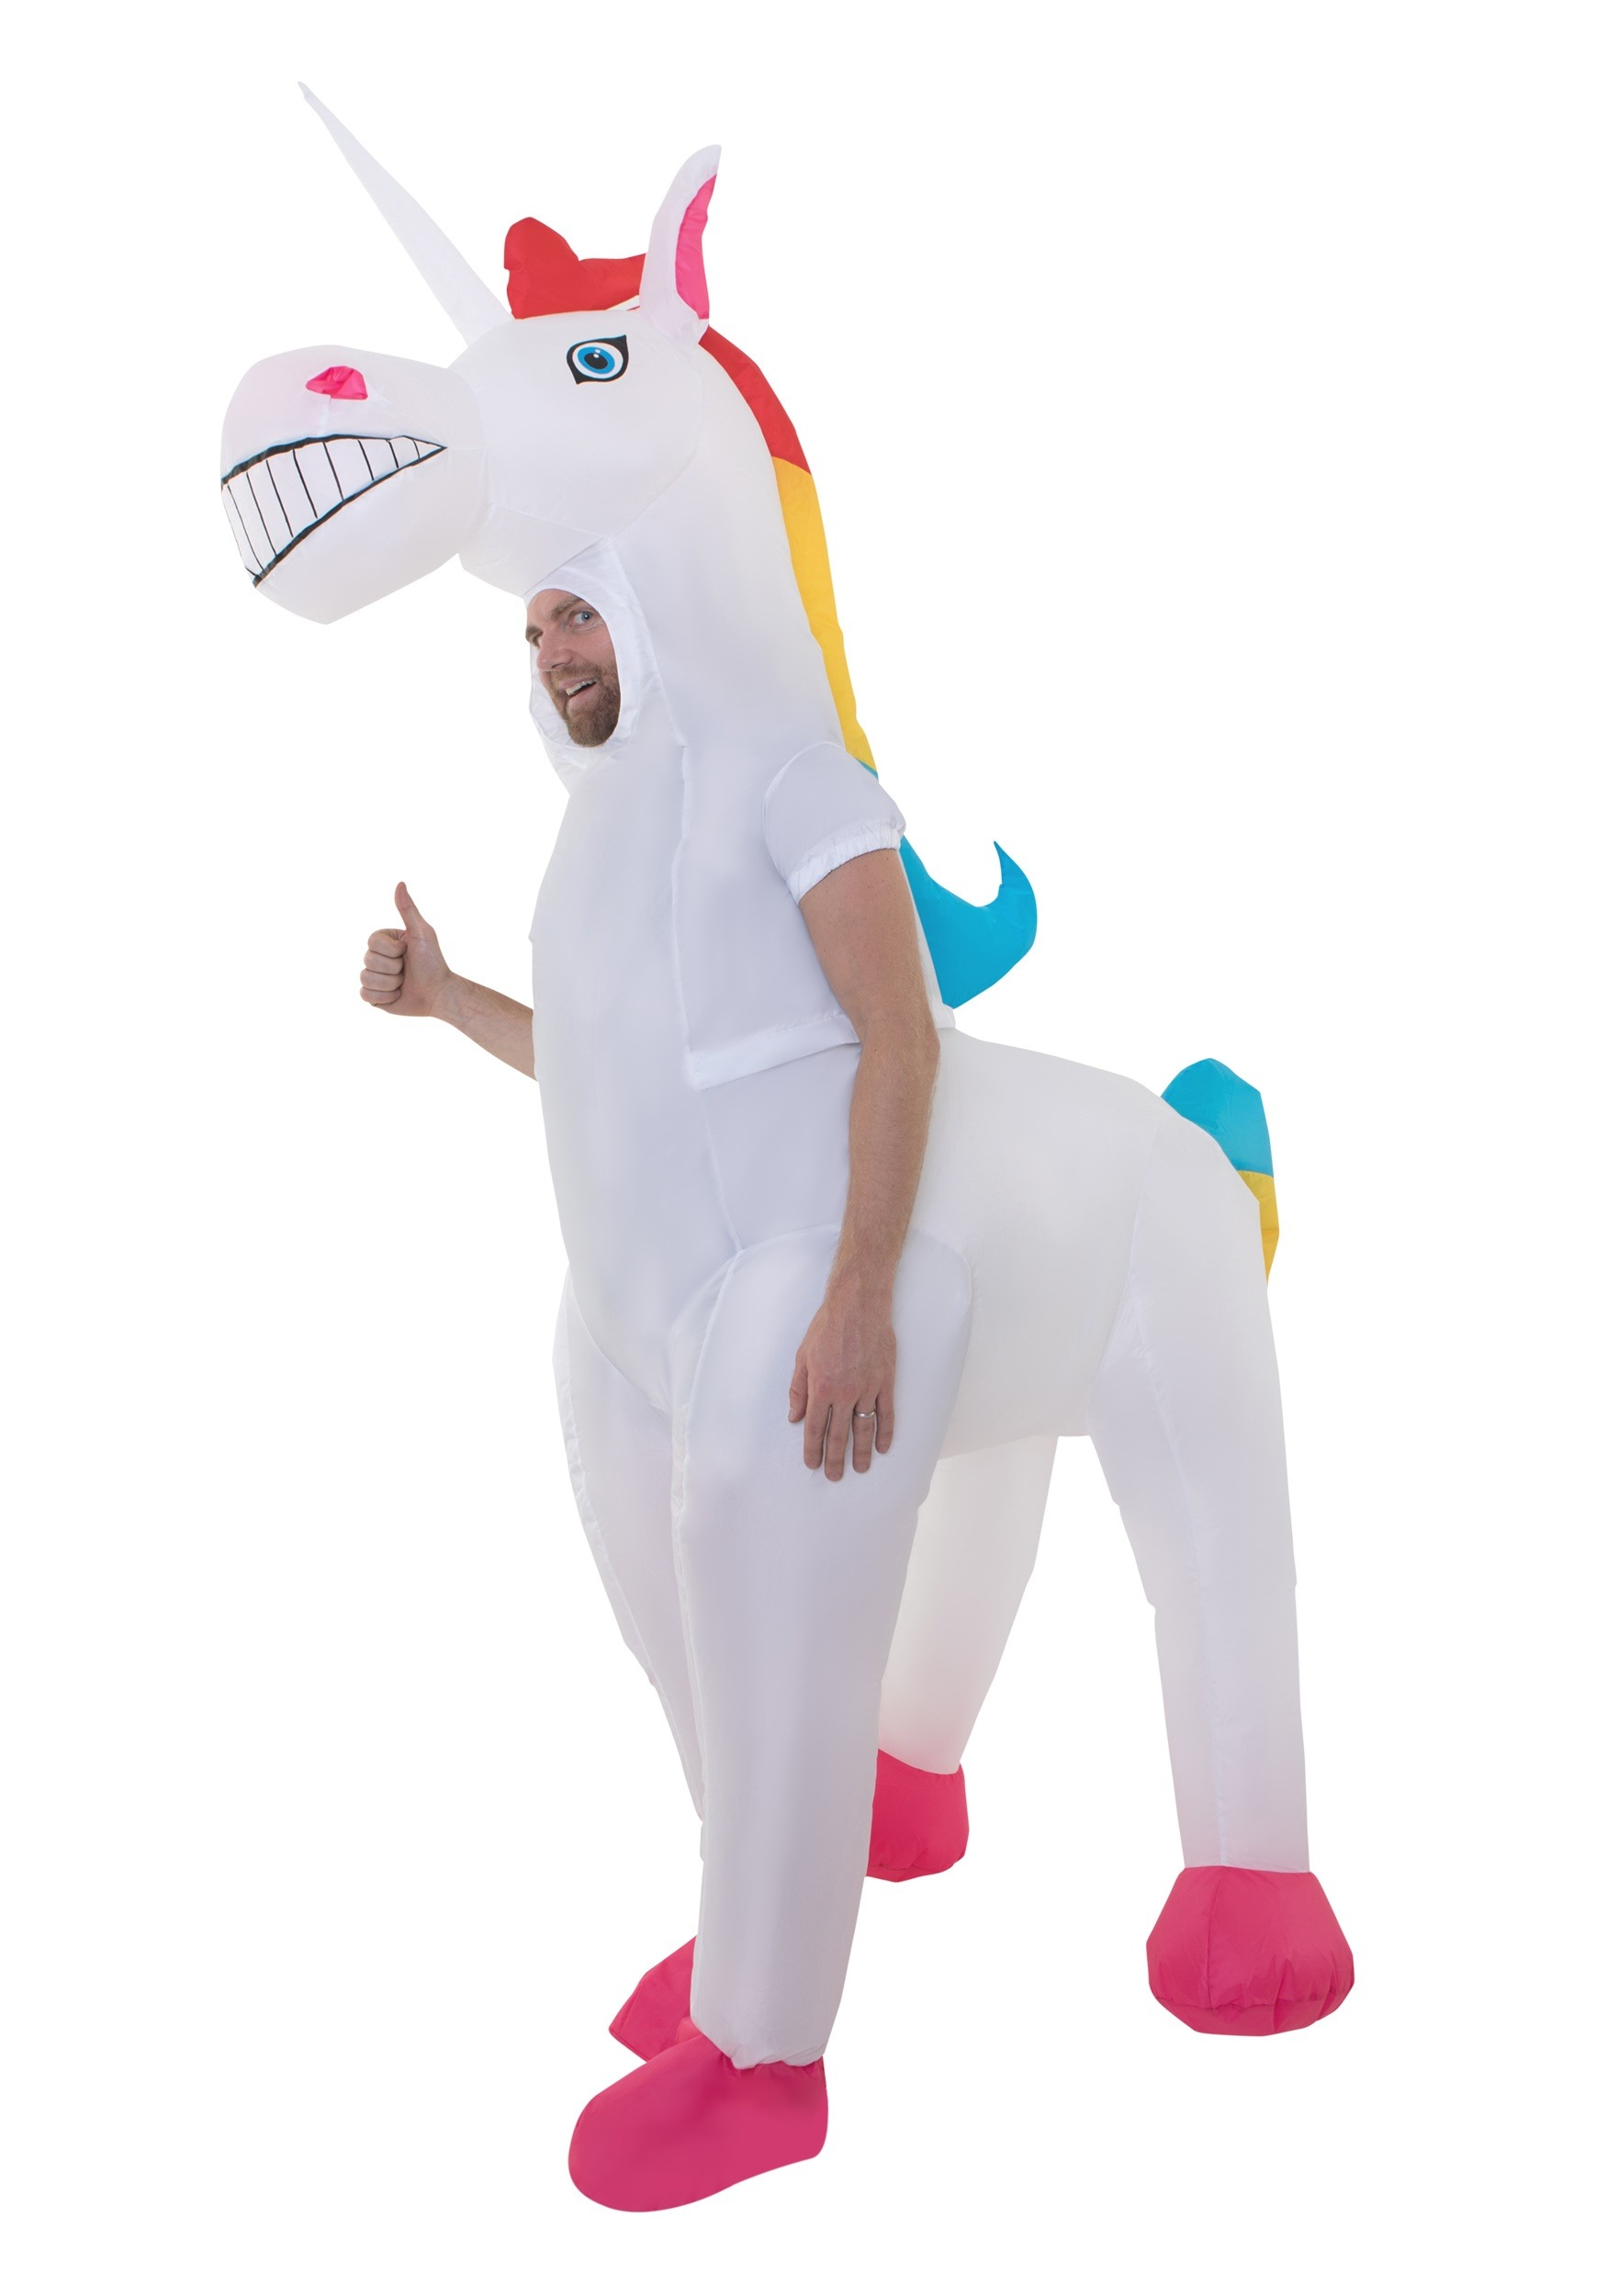 b45ff7729f6b Giant Inflatable Unicorn Costume for Adults